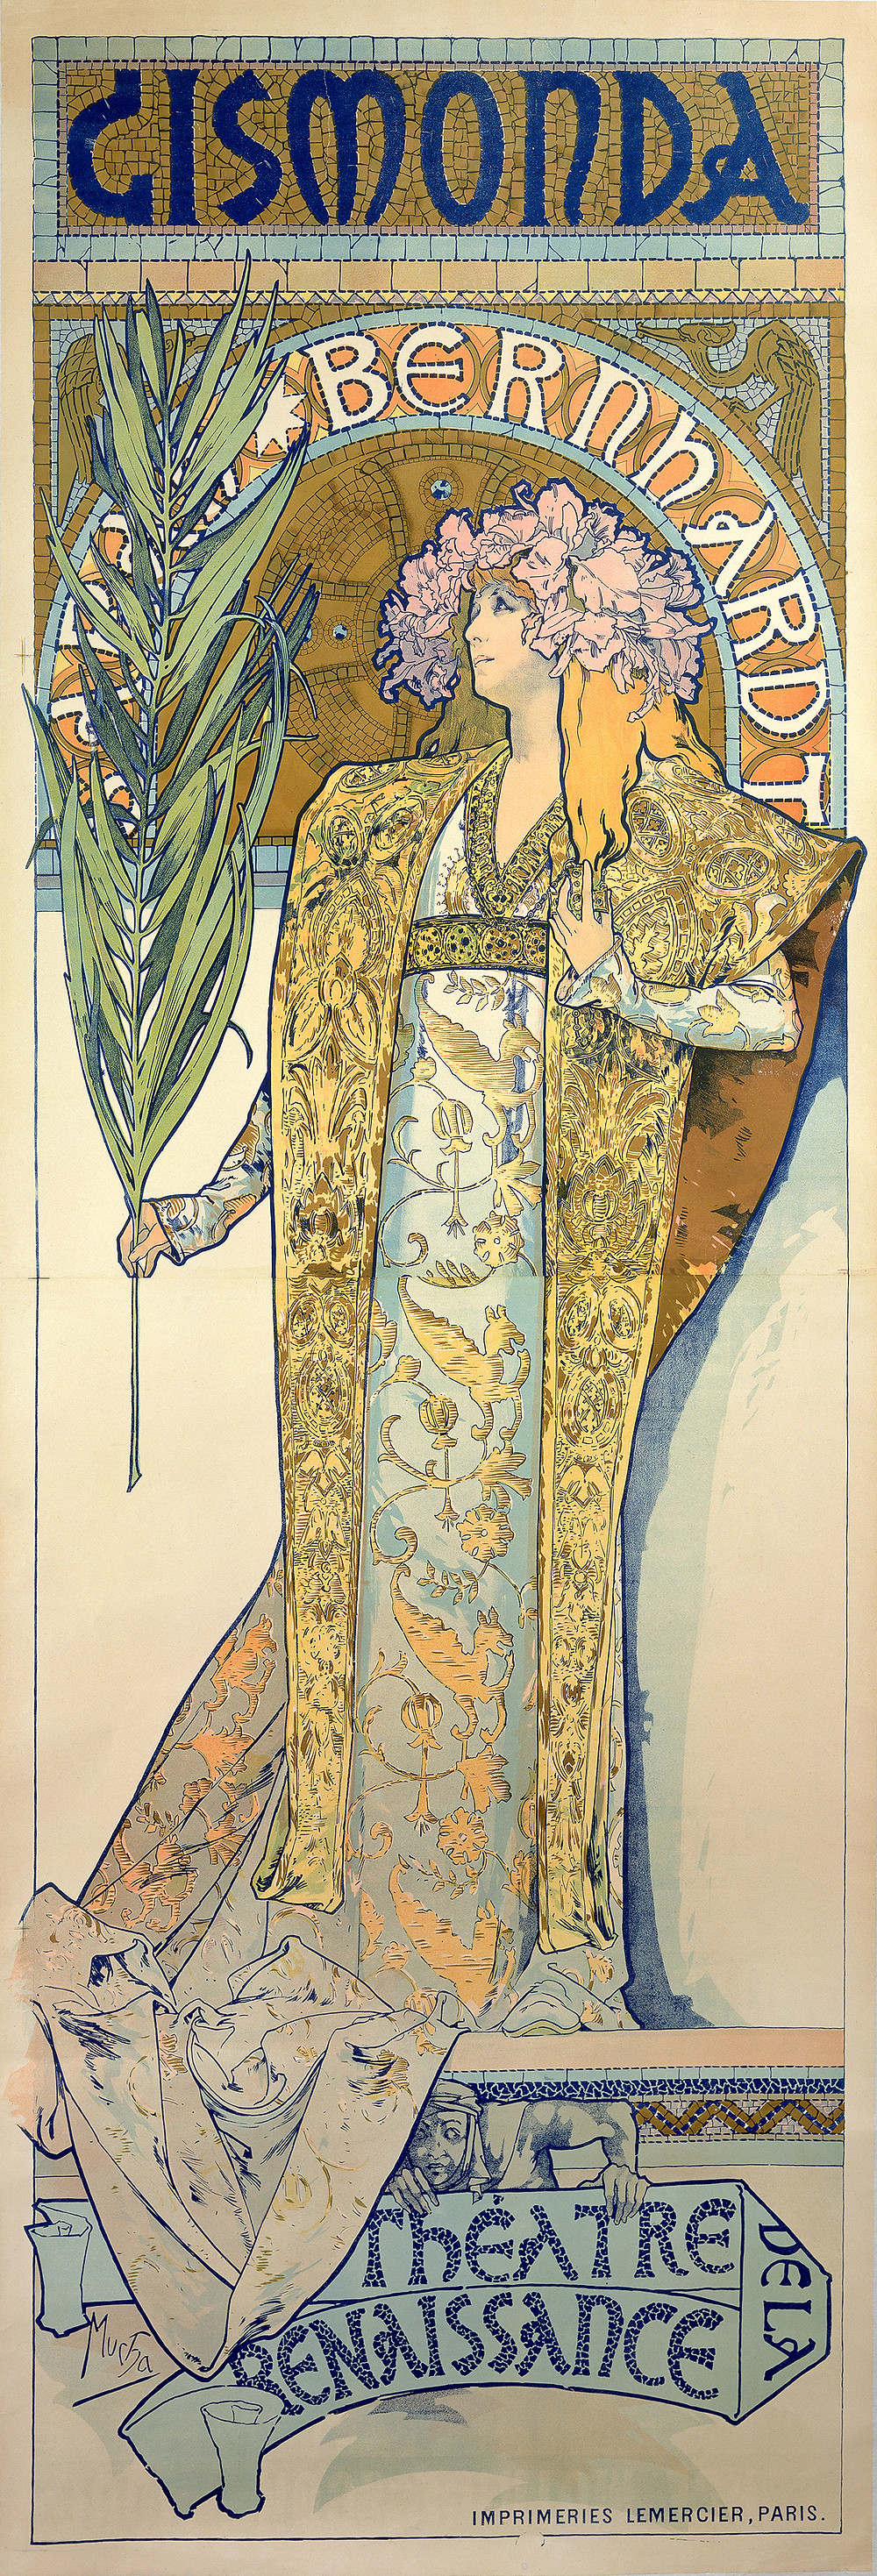 Gismonda 1894 lithography in couleur 216 x 74.2 cm Fondation Mucha, Prague © Mucha Trust 2018